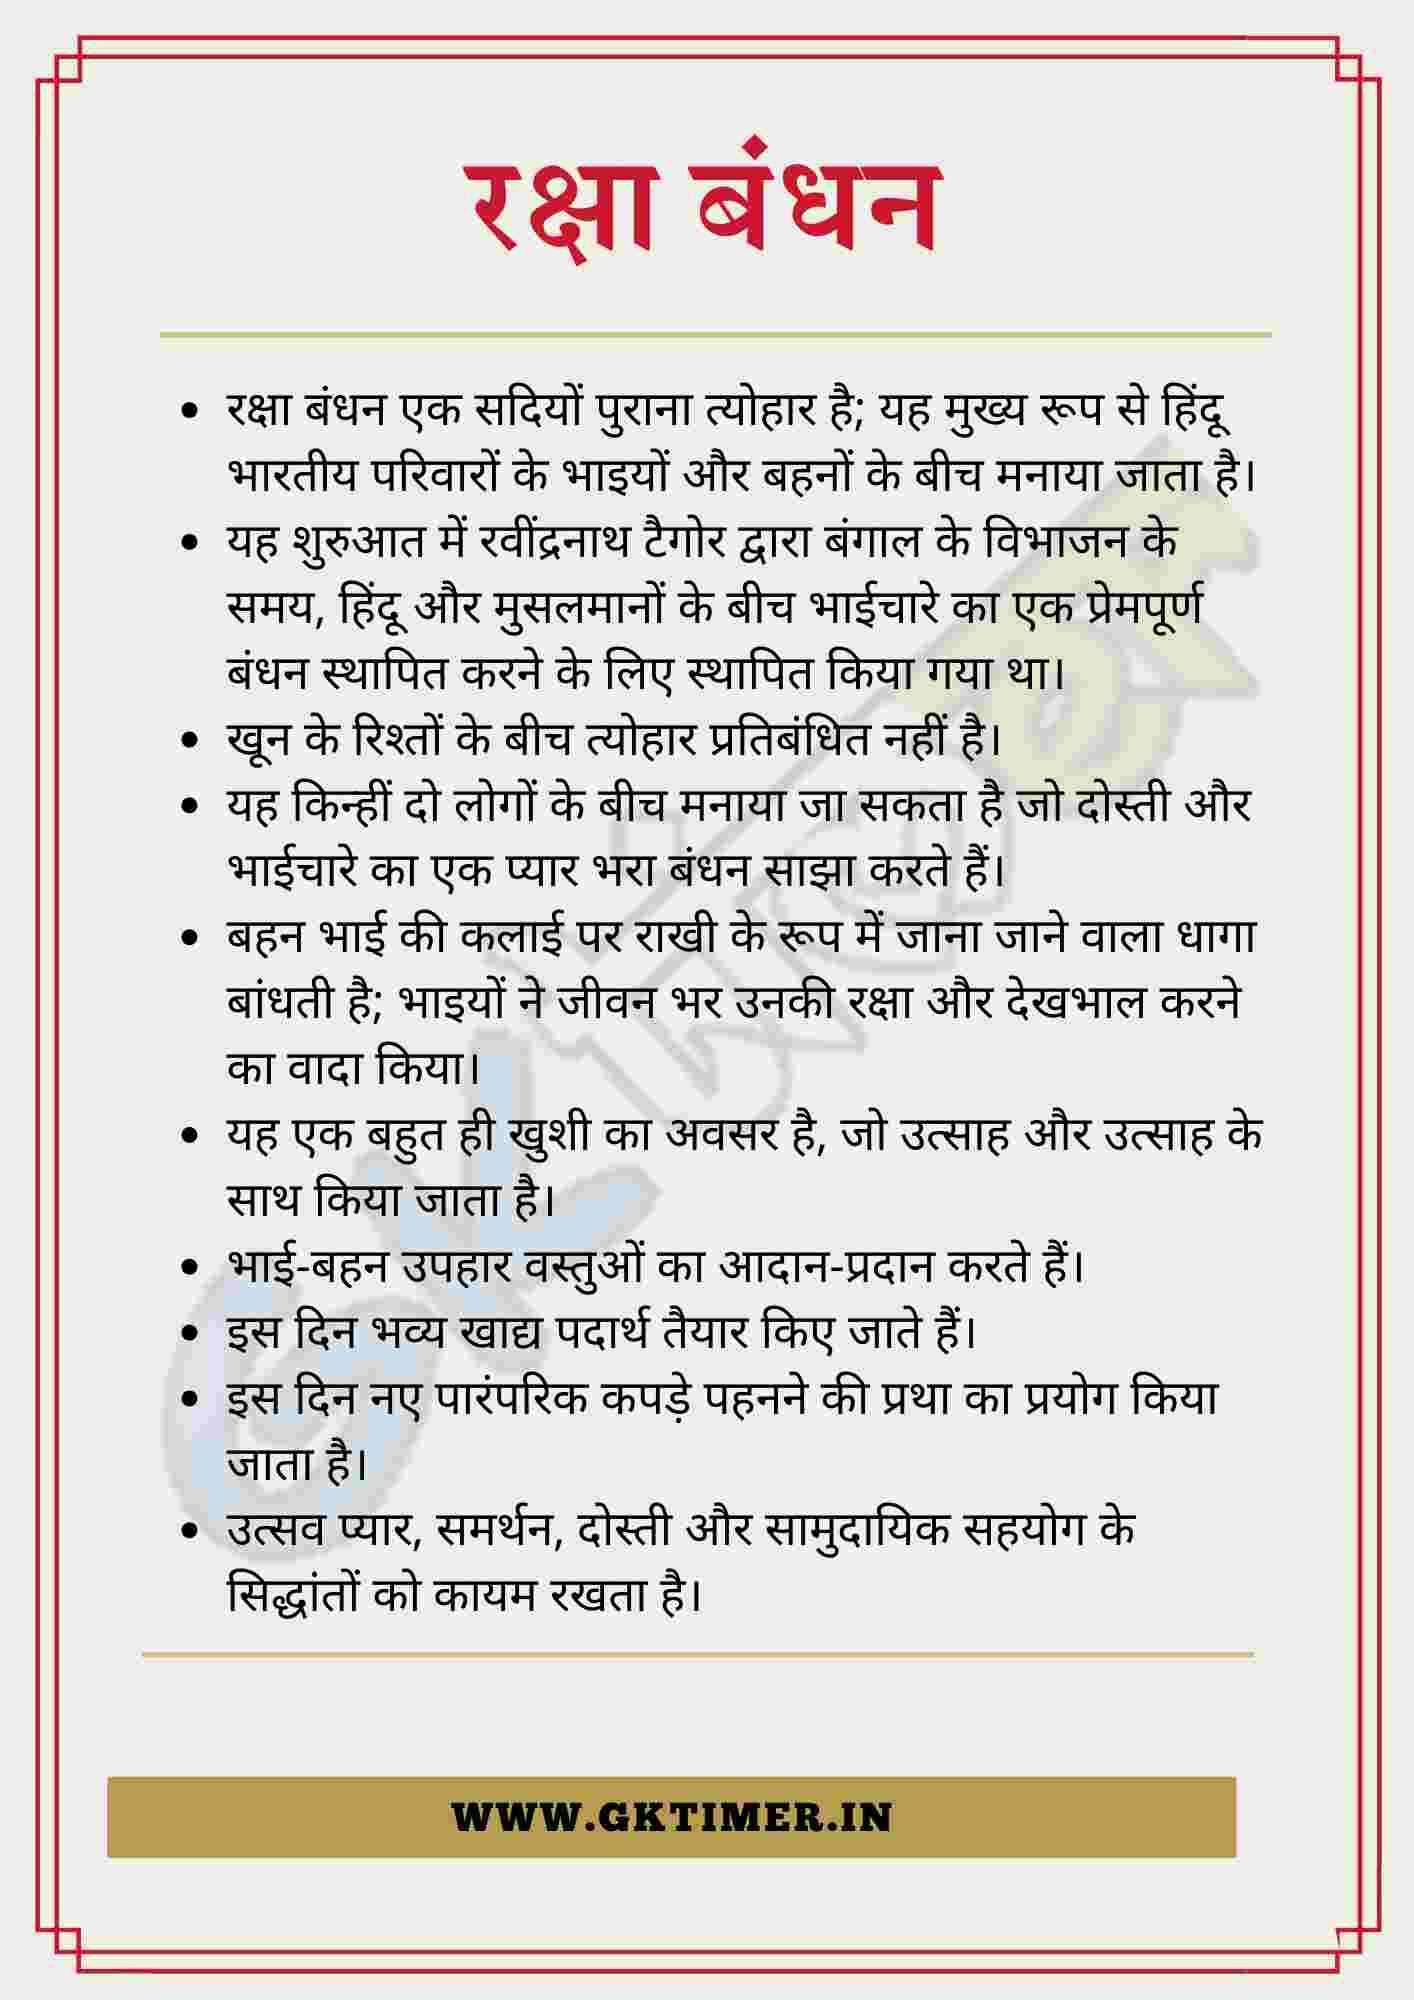 रक्षा बंधन पर निबंध | Raksha Bandhan Essay in Hindi | 10 Lines on Raksha Bandhan in Hindi